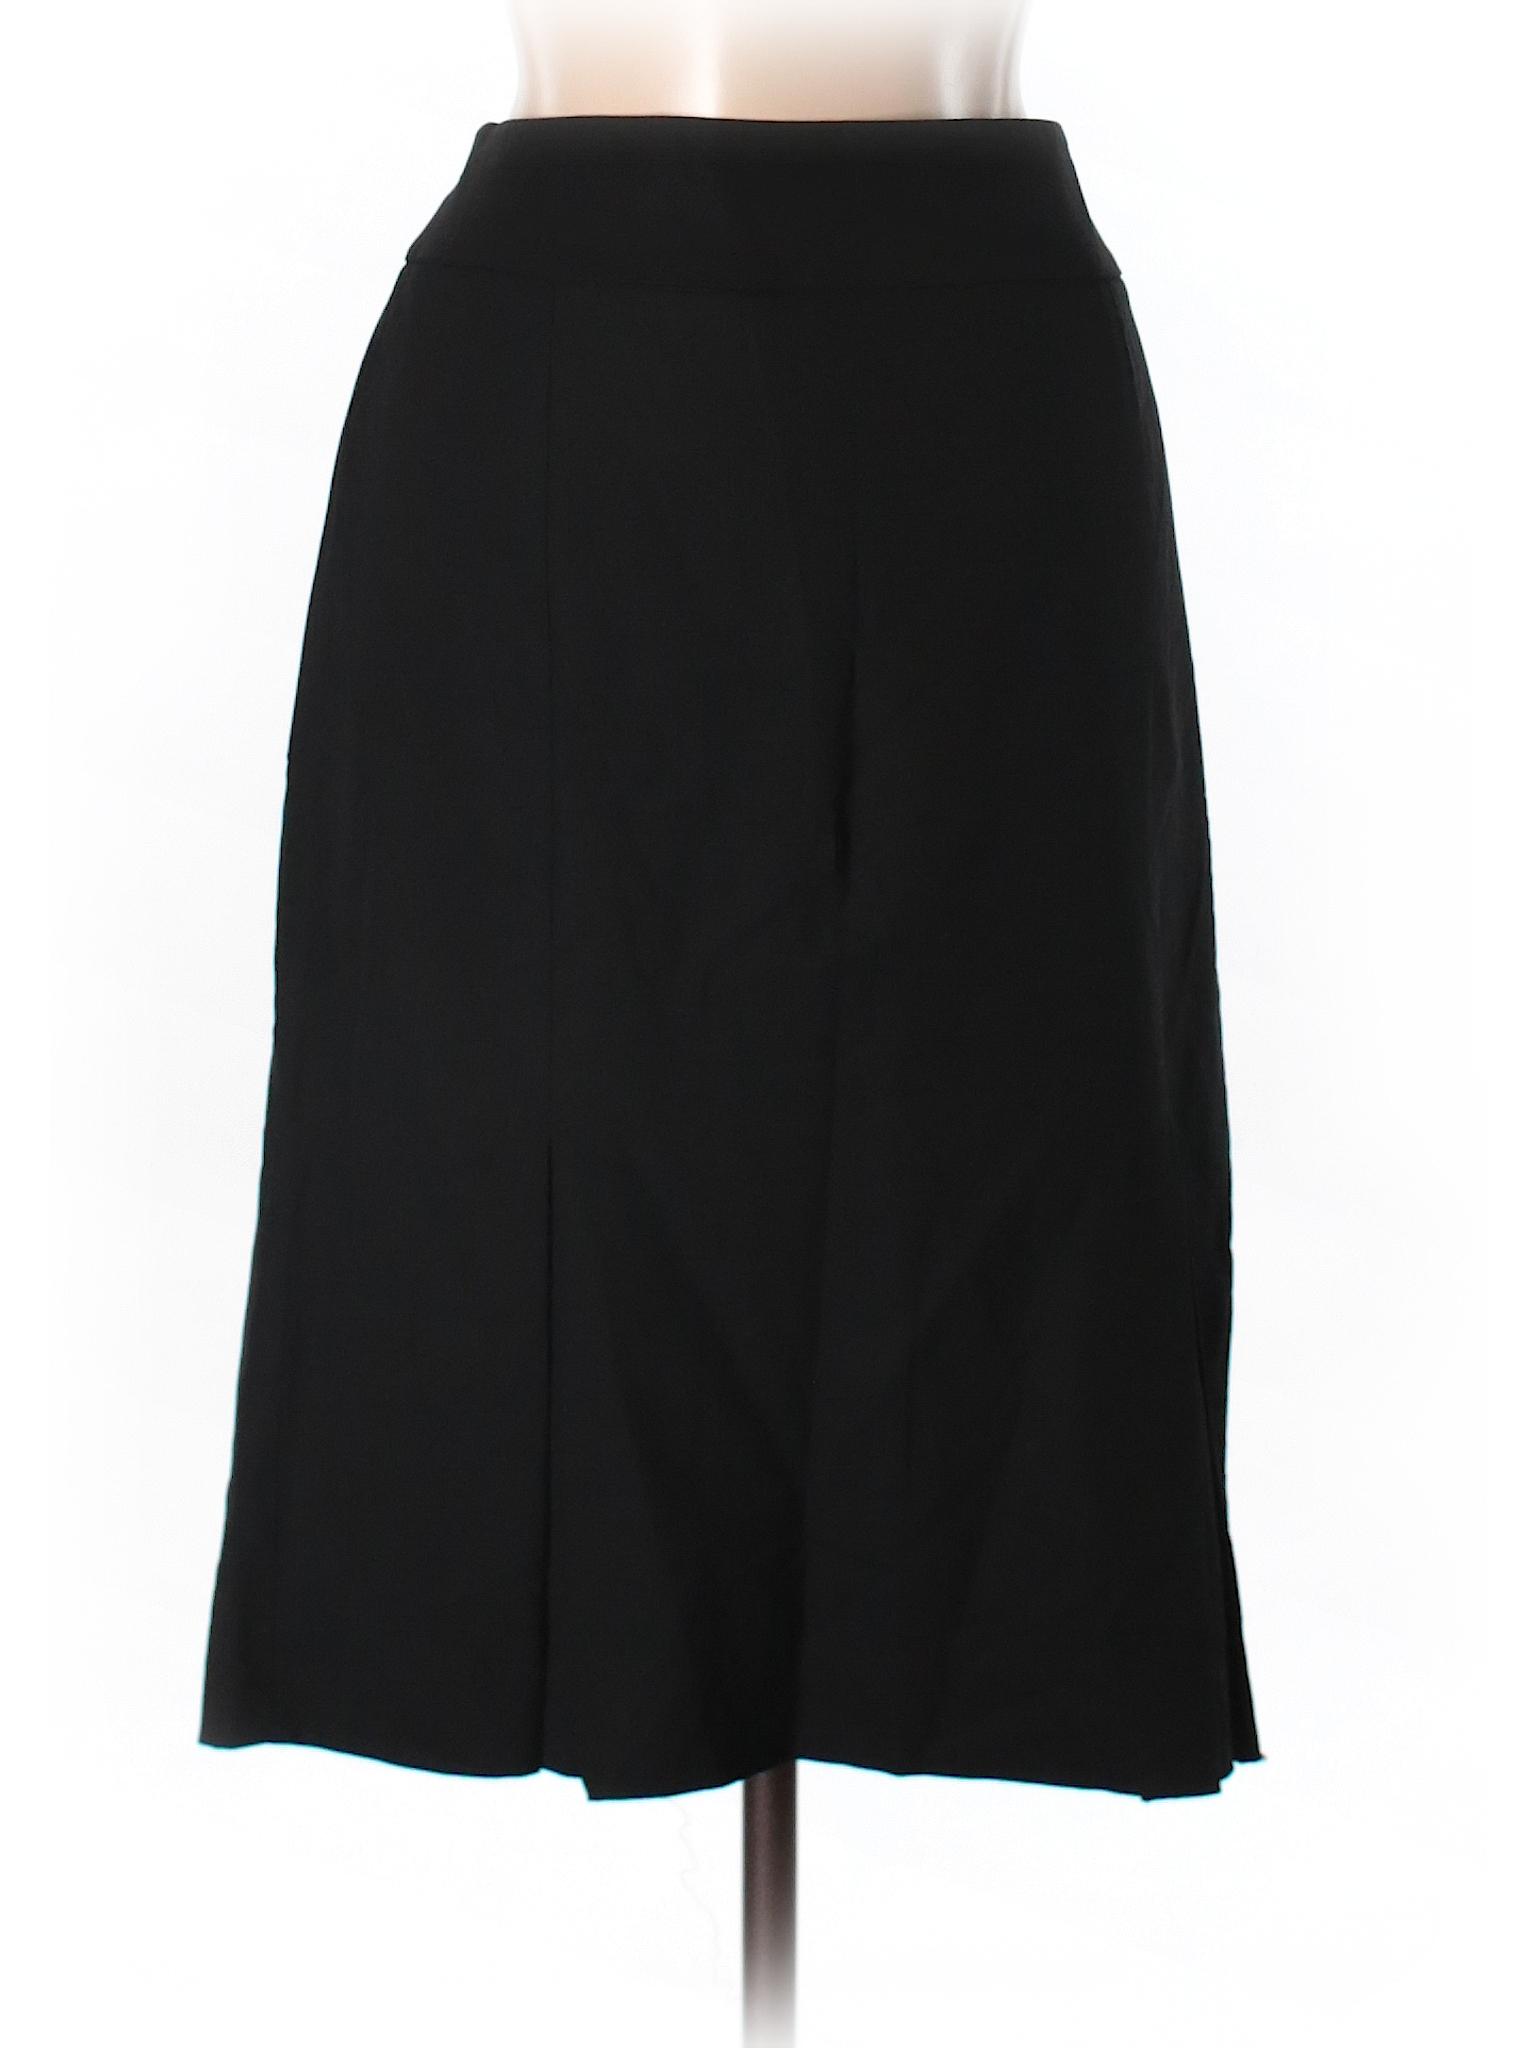 Boutique Casual Skirt Boutique Skirt Boutique Casual w7fqw